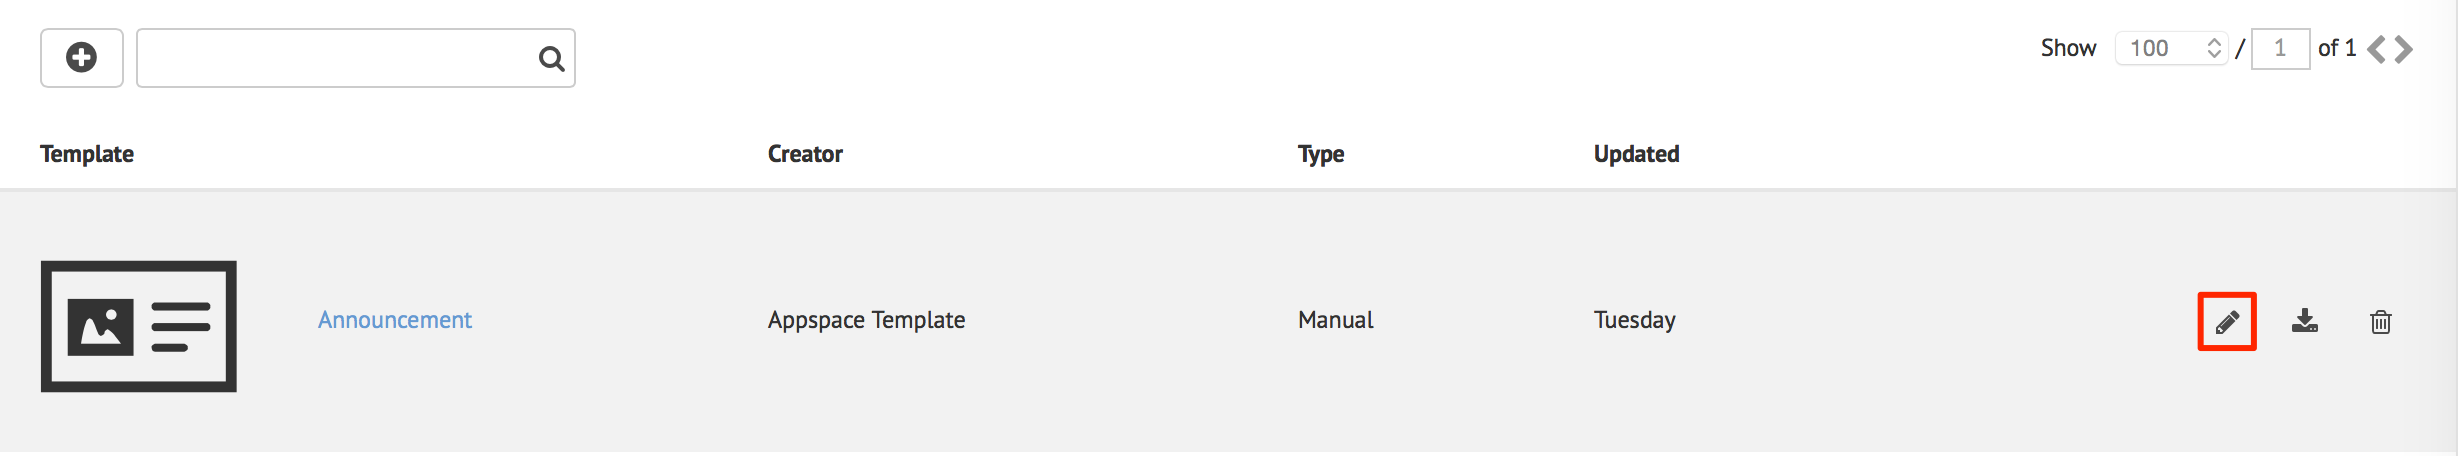 Adding a card template — Appspace v7 0 Documentation